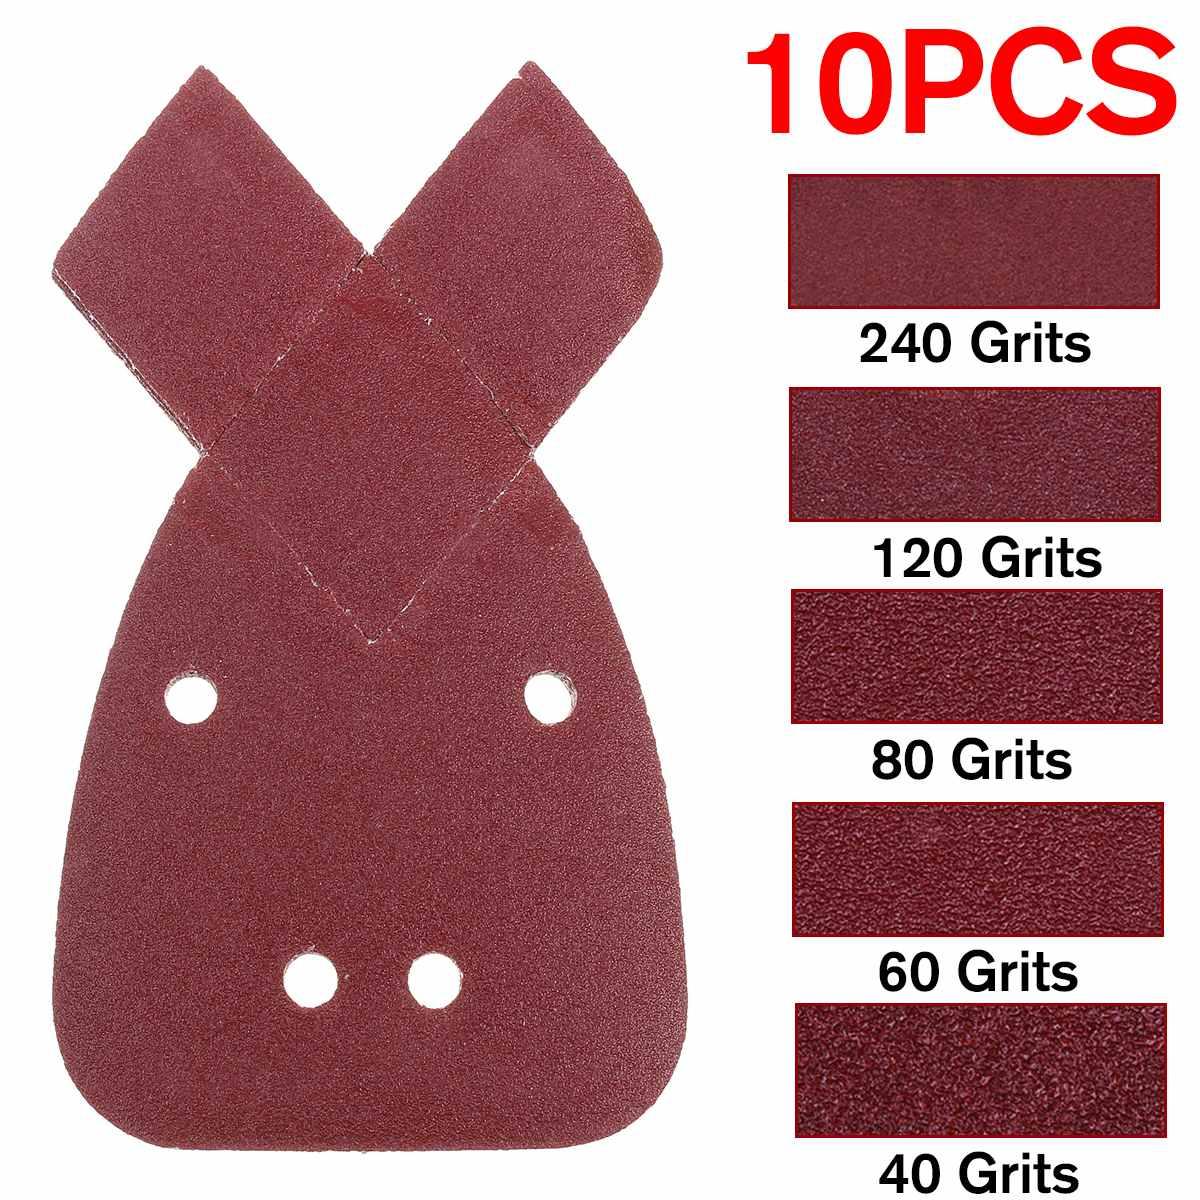 10pcs Sanding Paper 40/60/80/120/240Grit Mouses Sanding Sheets Pads Sand Paper For Black & Deckers Sander Polishing Papers